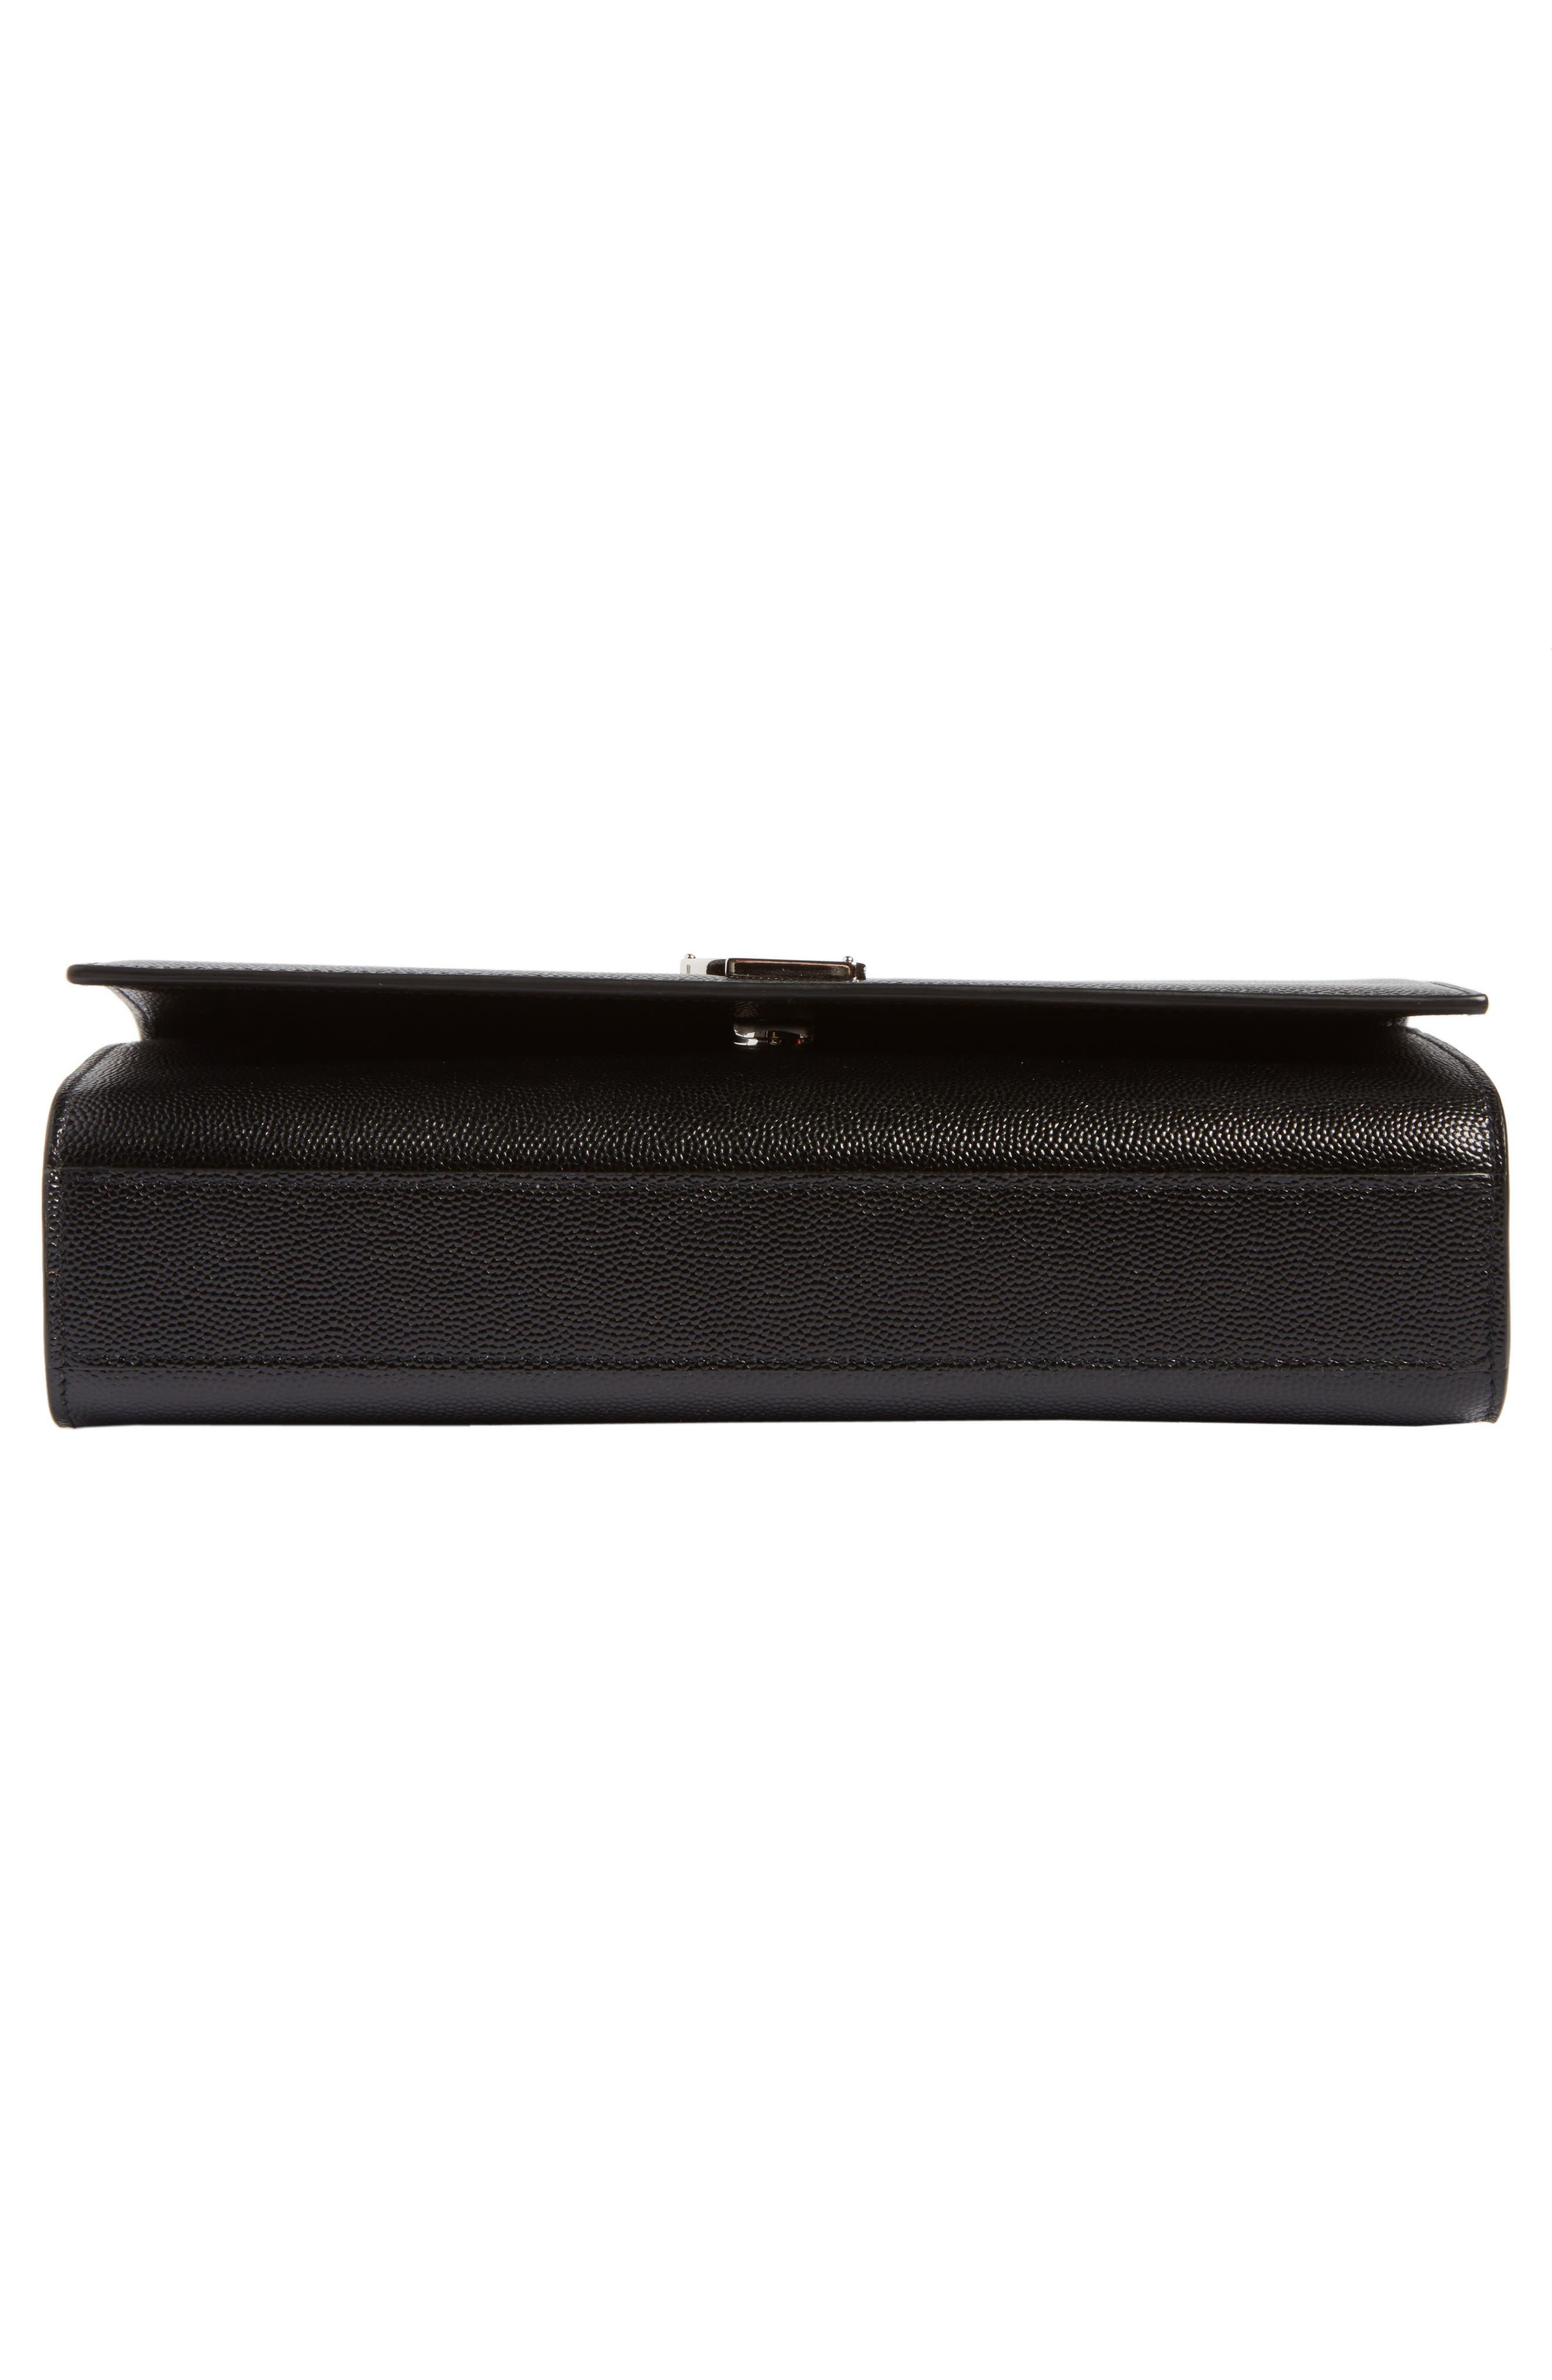 Medium Kate Calfskin Leather Shoulder Bag,                             Alternate thumbnail 6, color,                             NERO